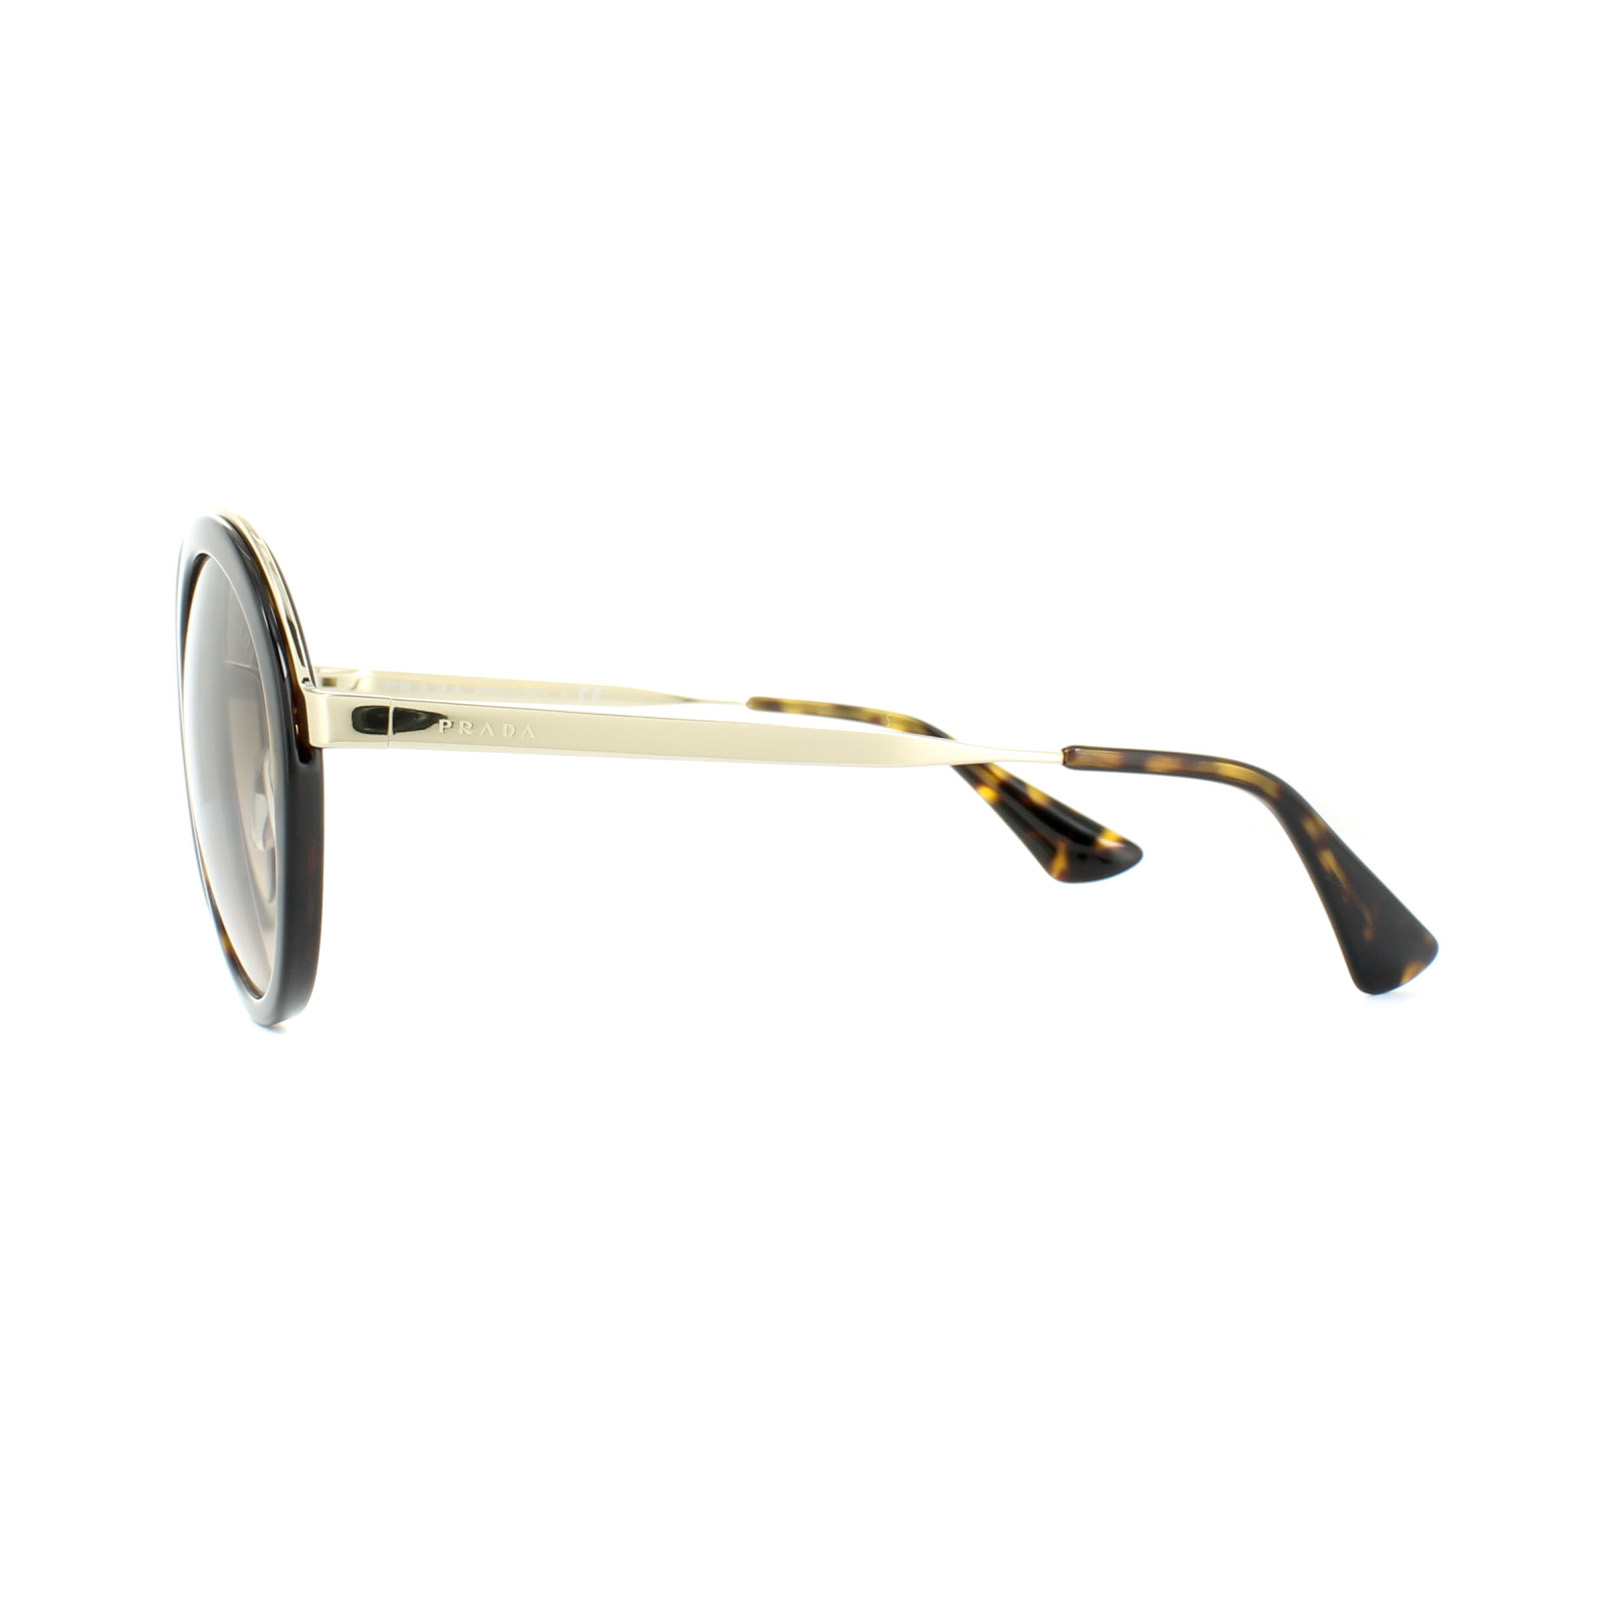 875fd68d83c ... canada sentinel prada sunglasses 50ts 2au3d0 havana brown gradient  5eb6b 7768d